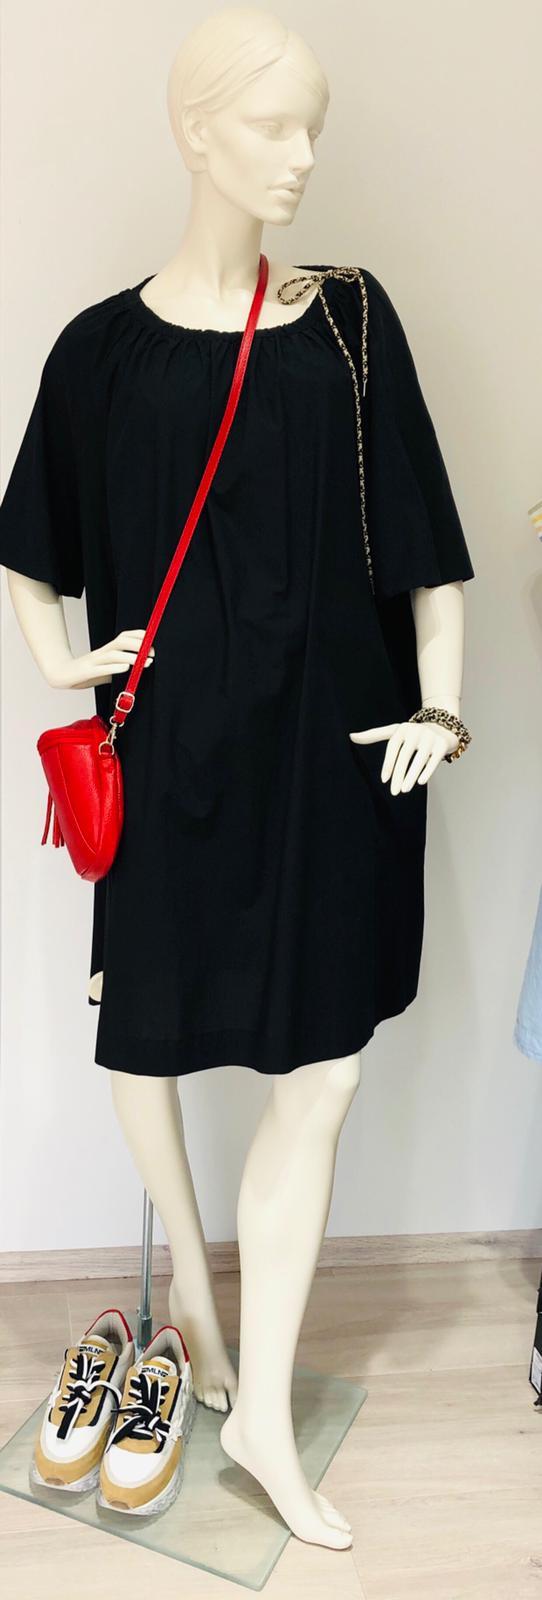 schwarzes Kleid anling mode Bad Dürkheim